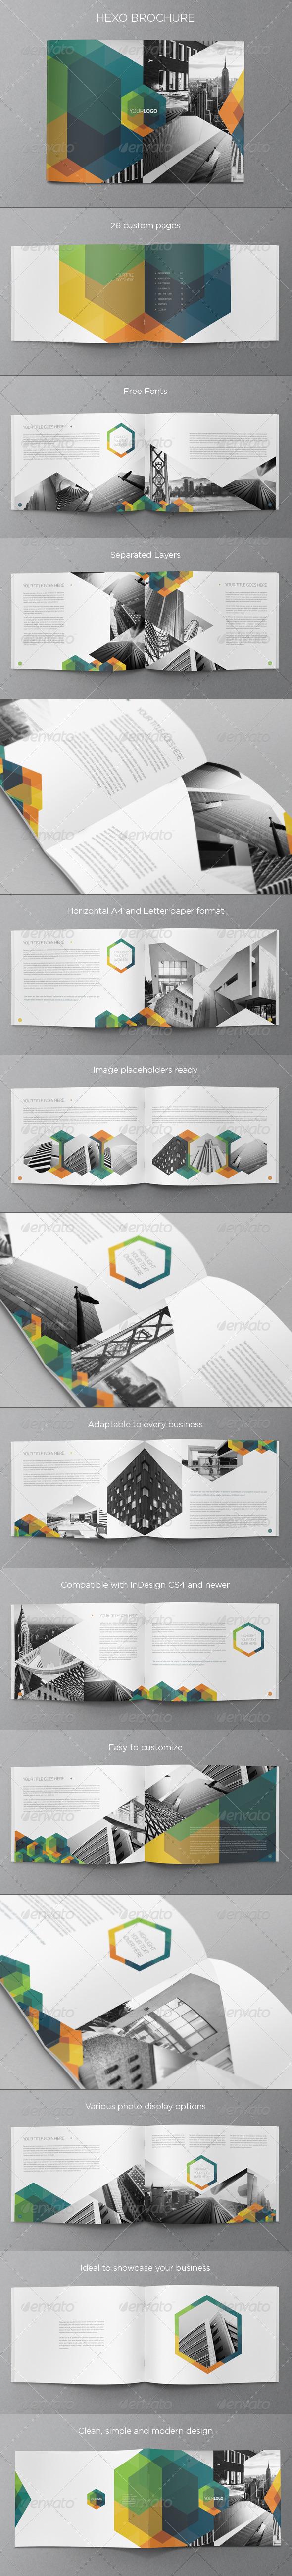 Modern Real Estate Hexo Brochure - Brochures Print Templates